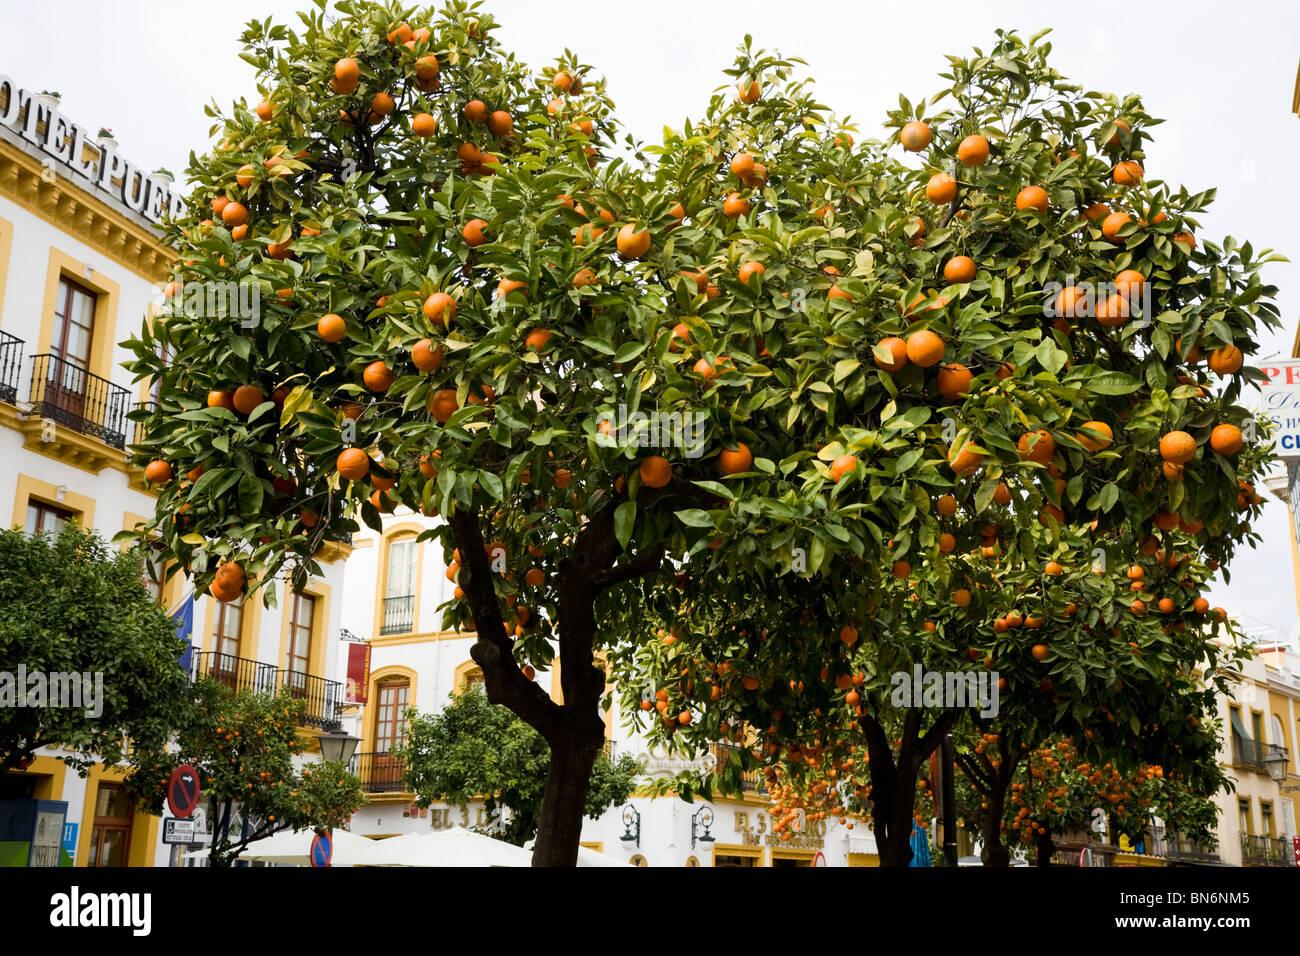 Fruiting Orange Fruit Tree Trees Growing On The Street